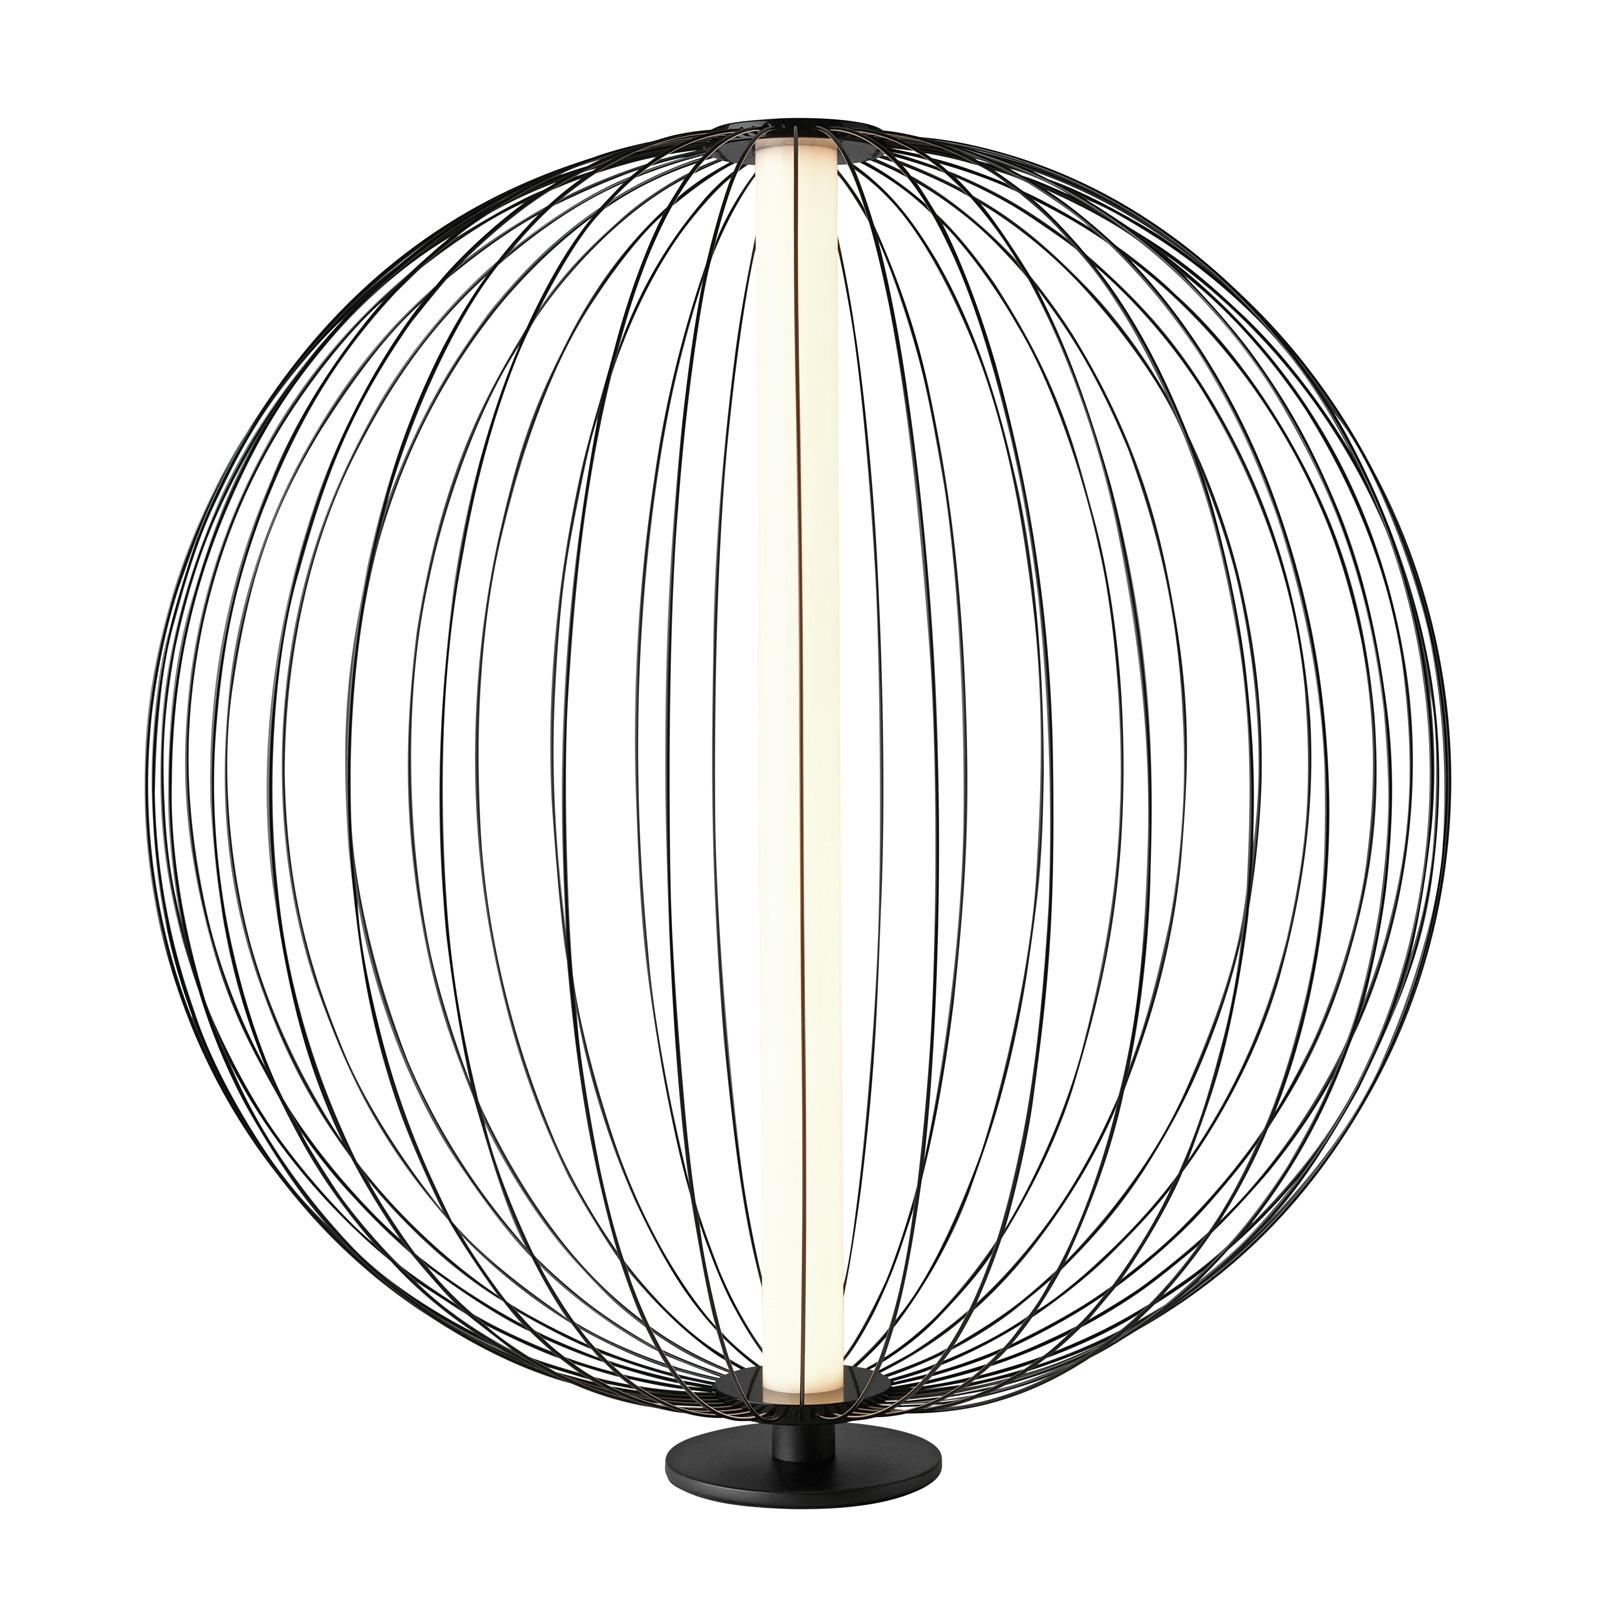 Lampe à poser LED Atomic, abat-jour variable